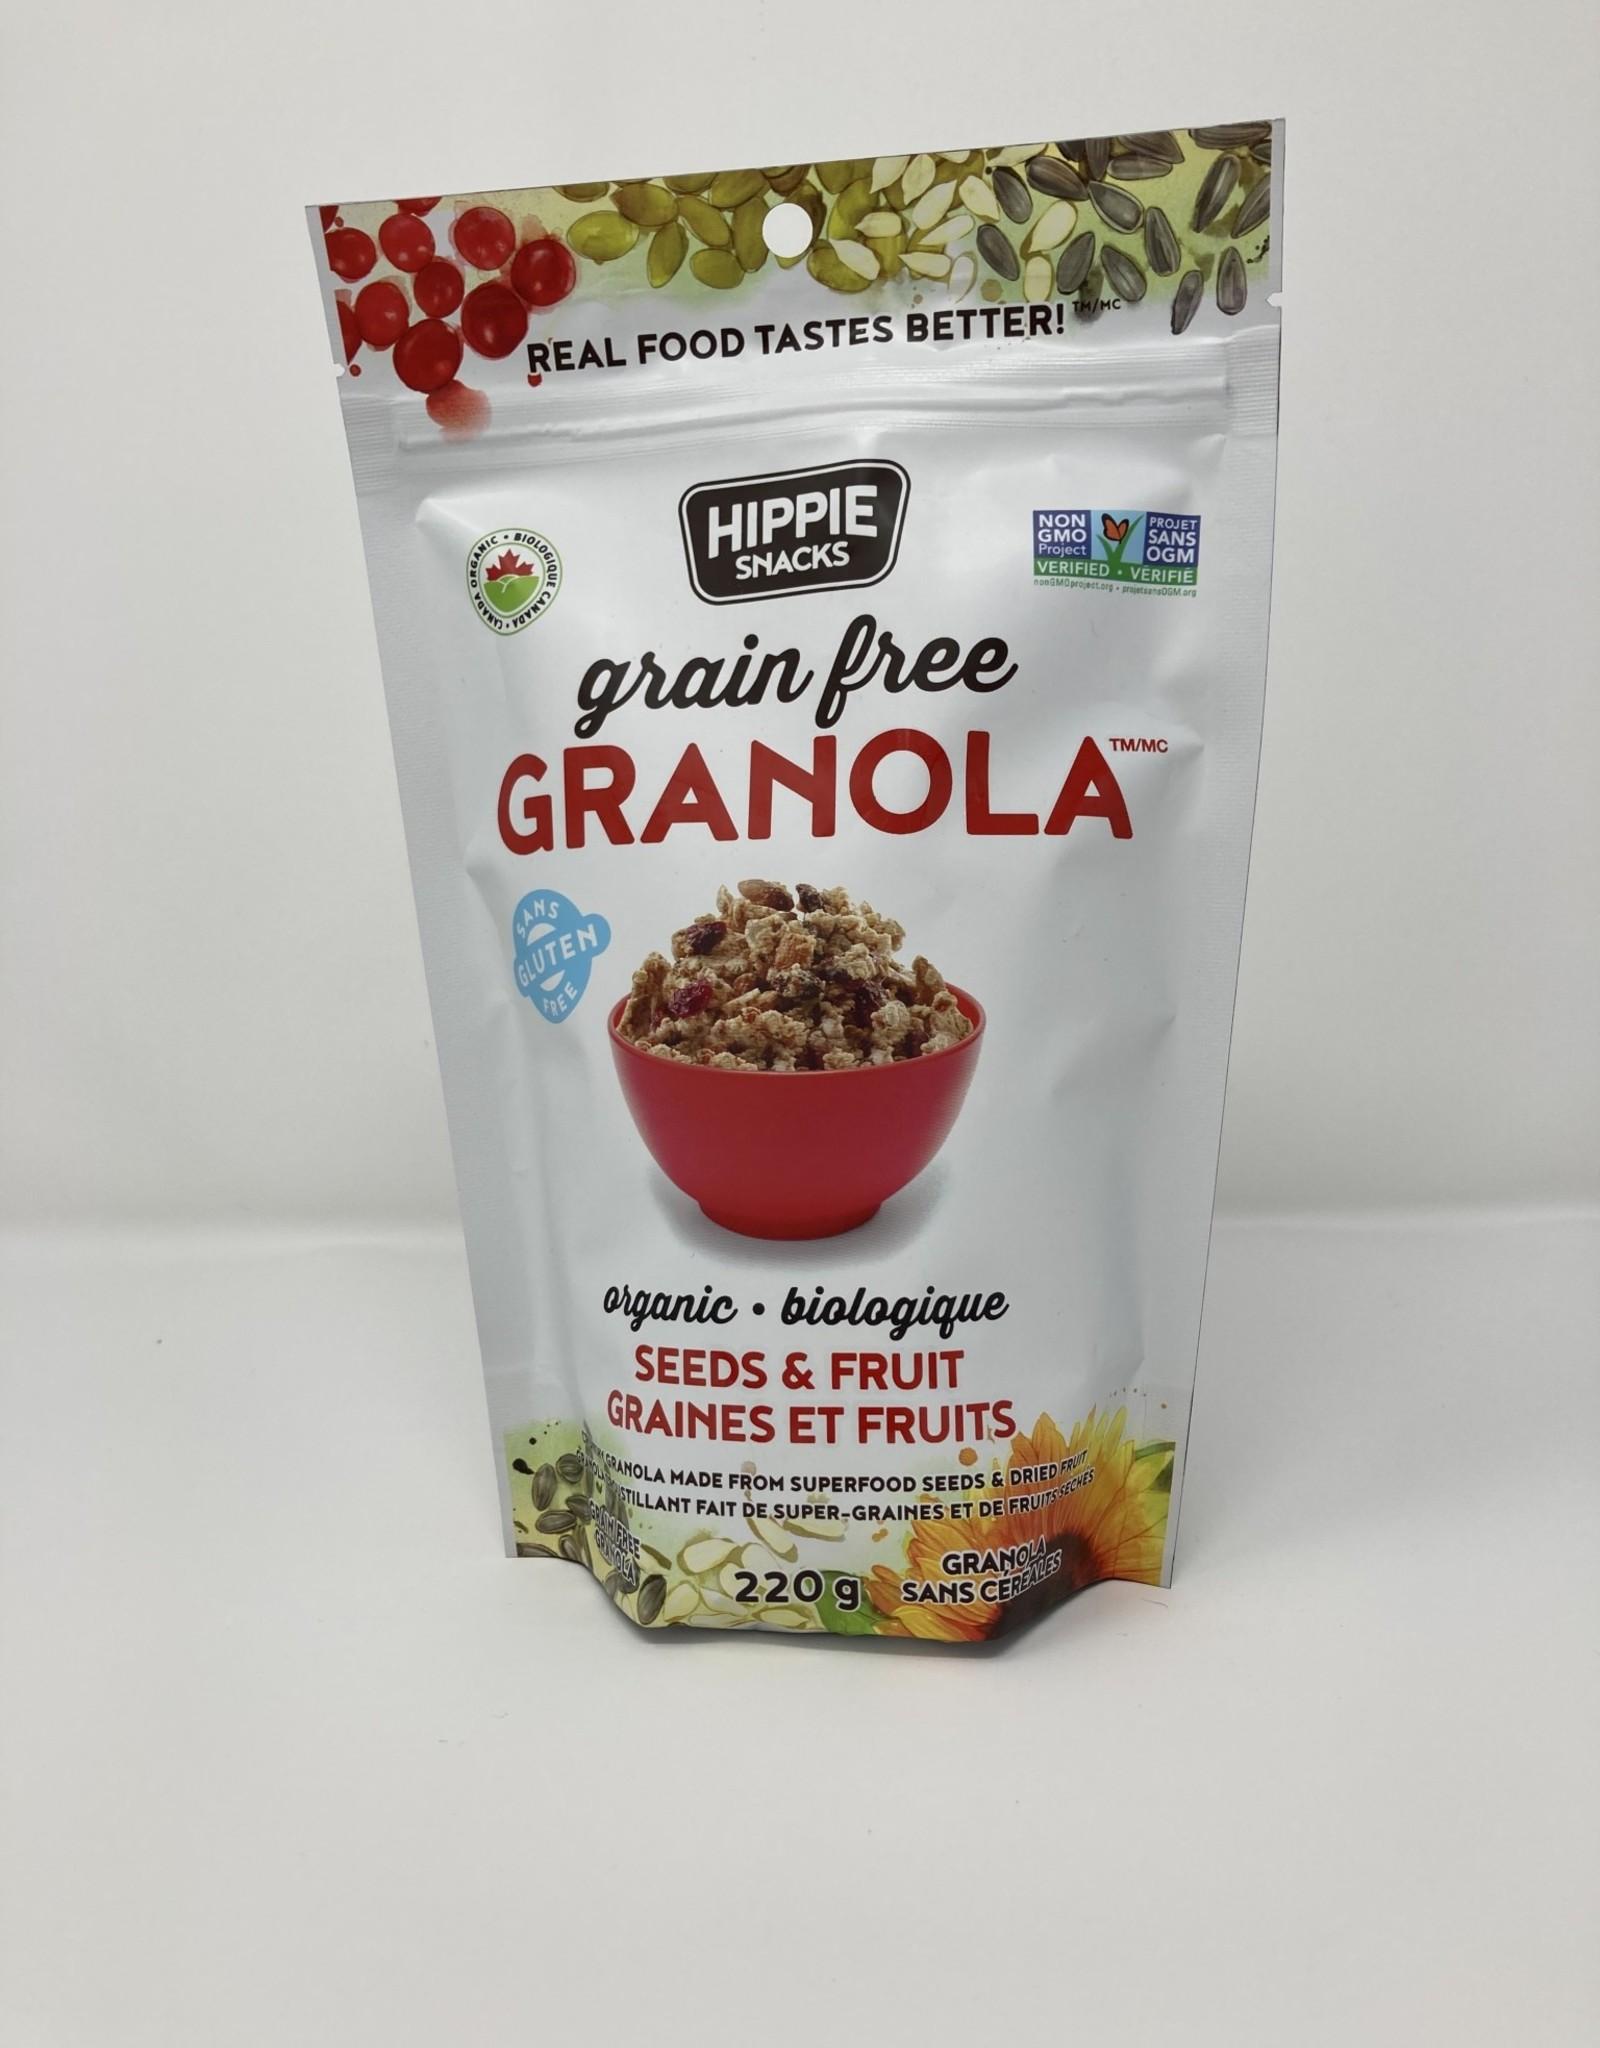 Hippie Snacks Hippie Snacks - Granola, Seeds and Fruit